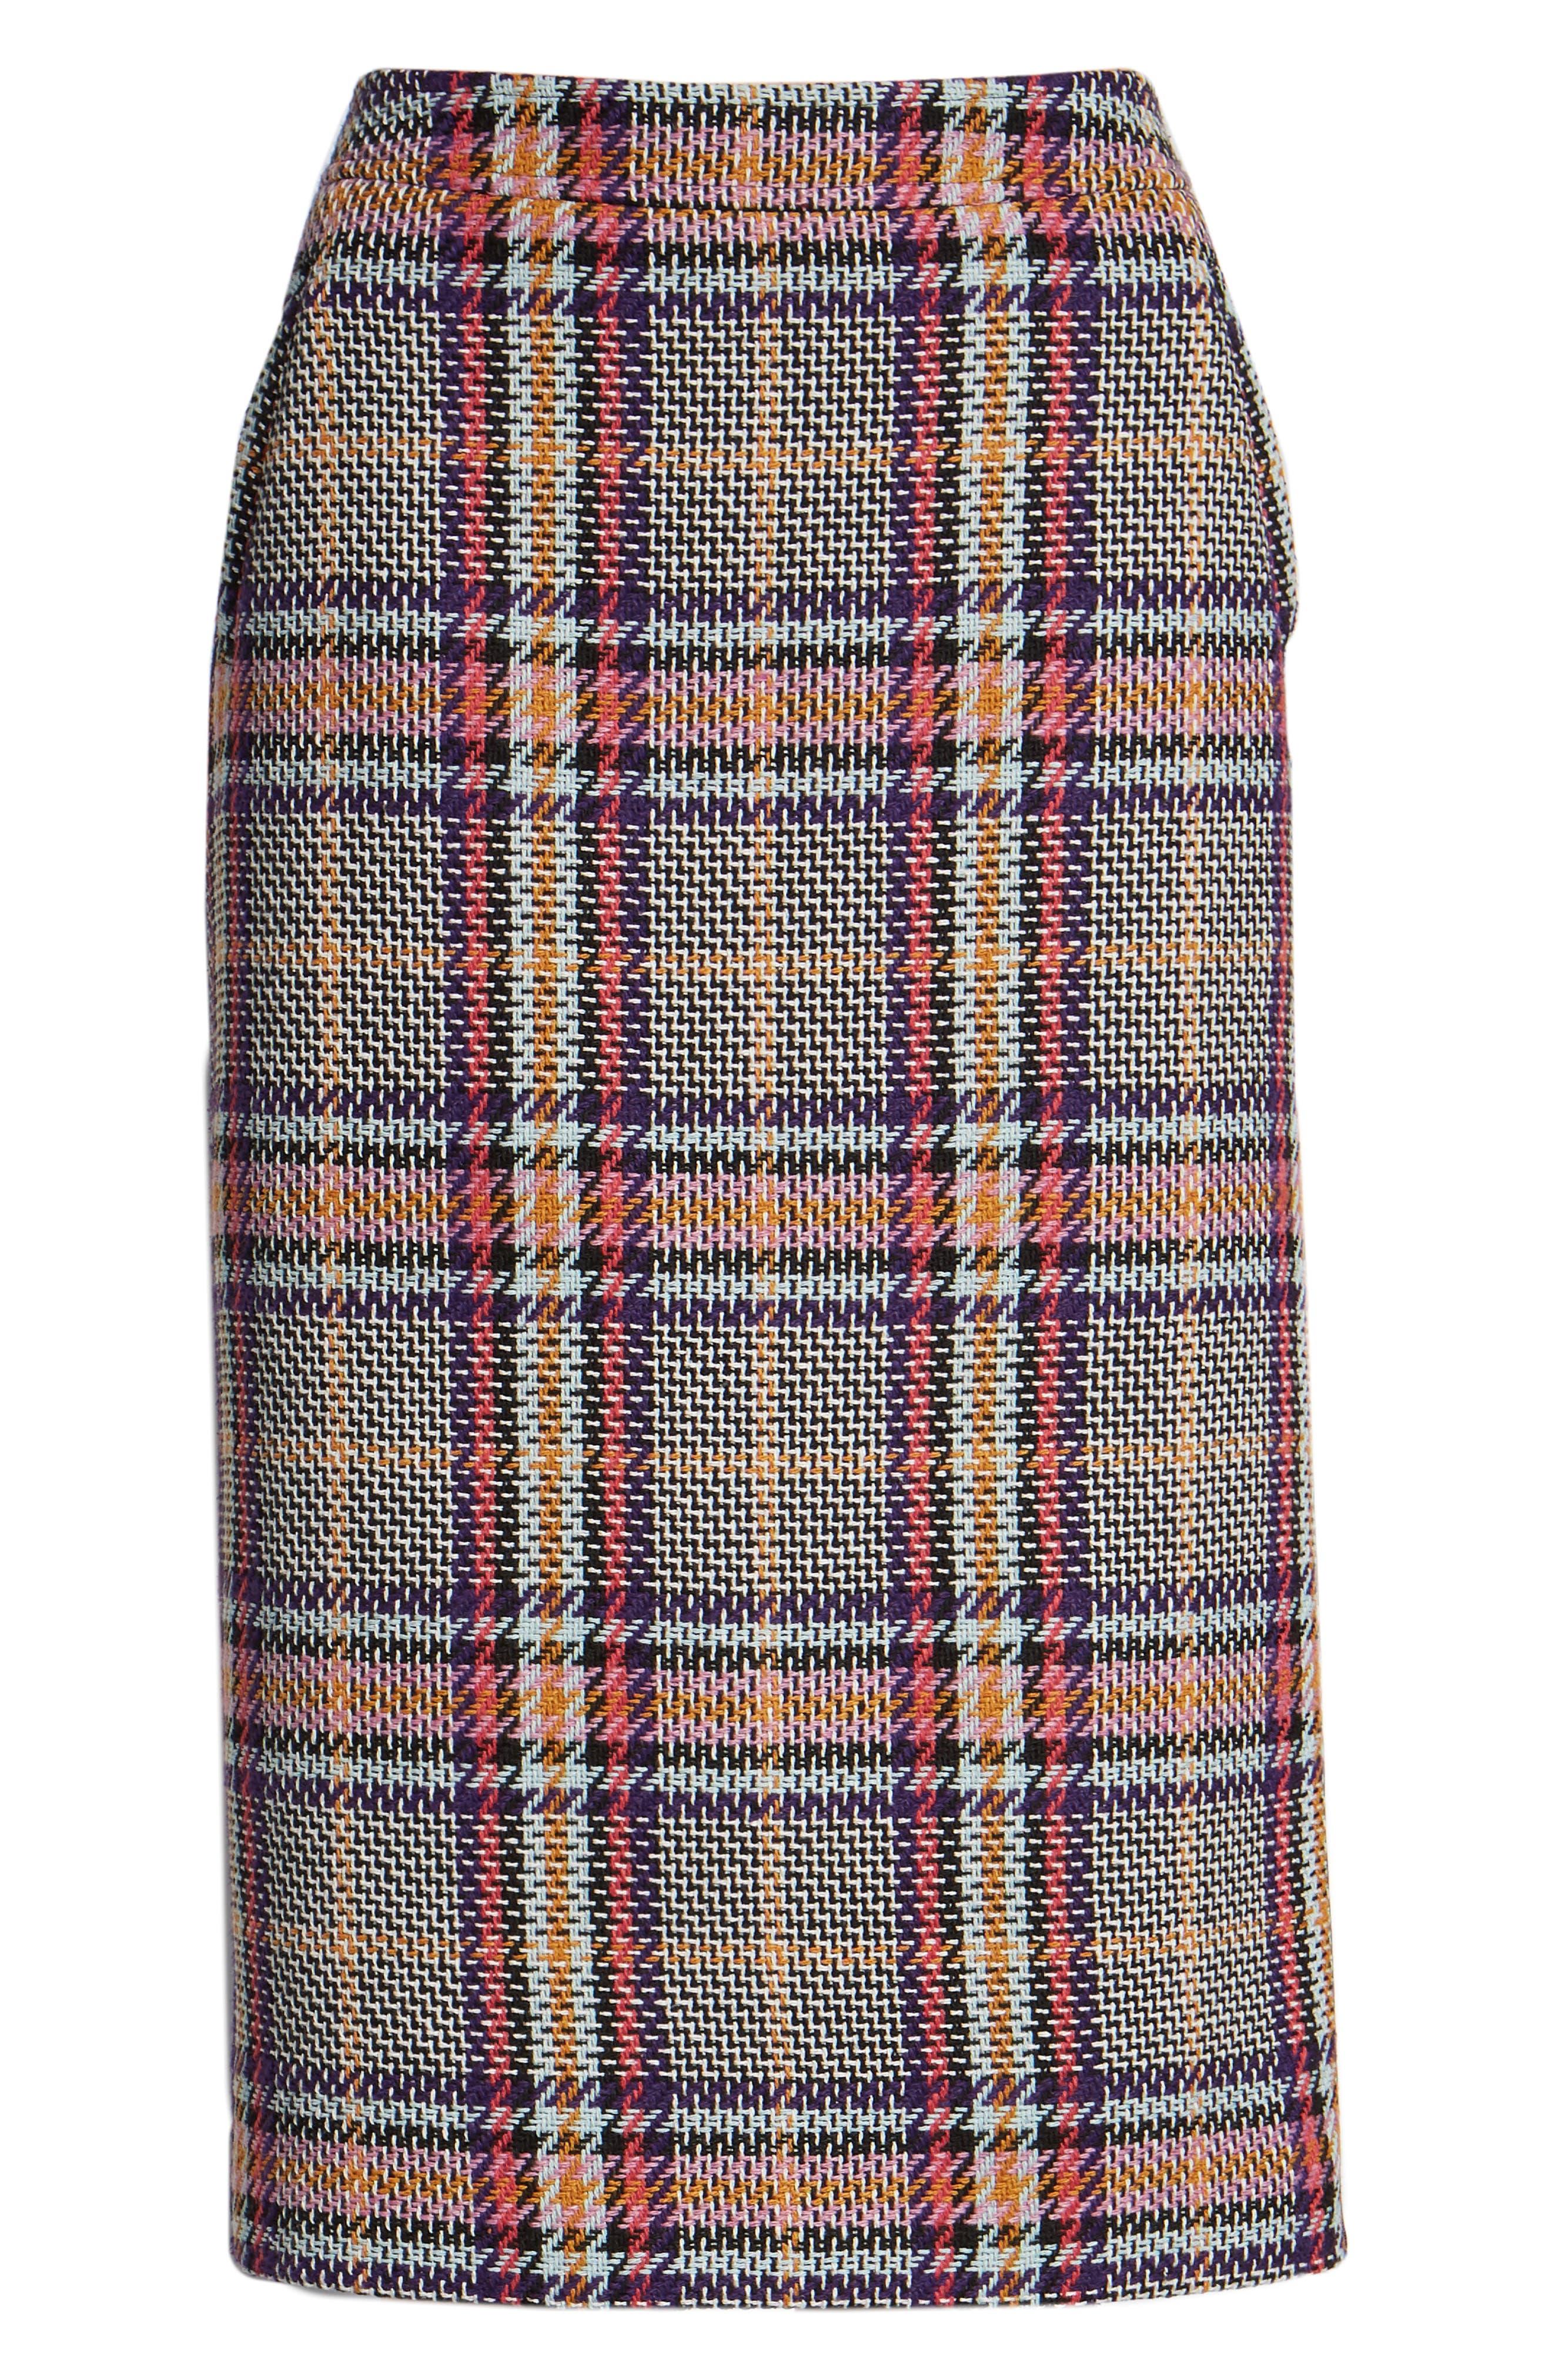 Plaid Pencil Skirt,                             Alternate thumbnail 6, color,                             530